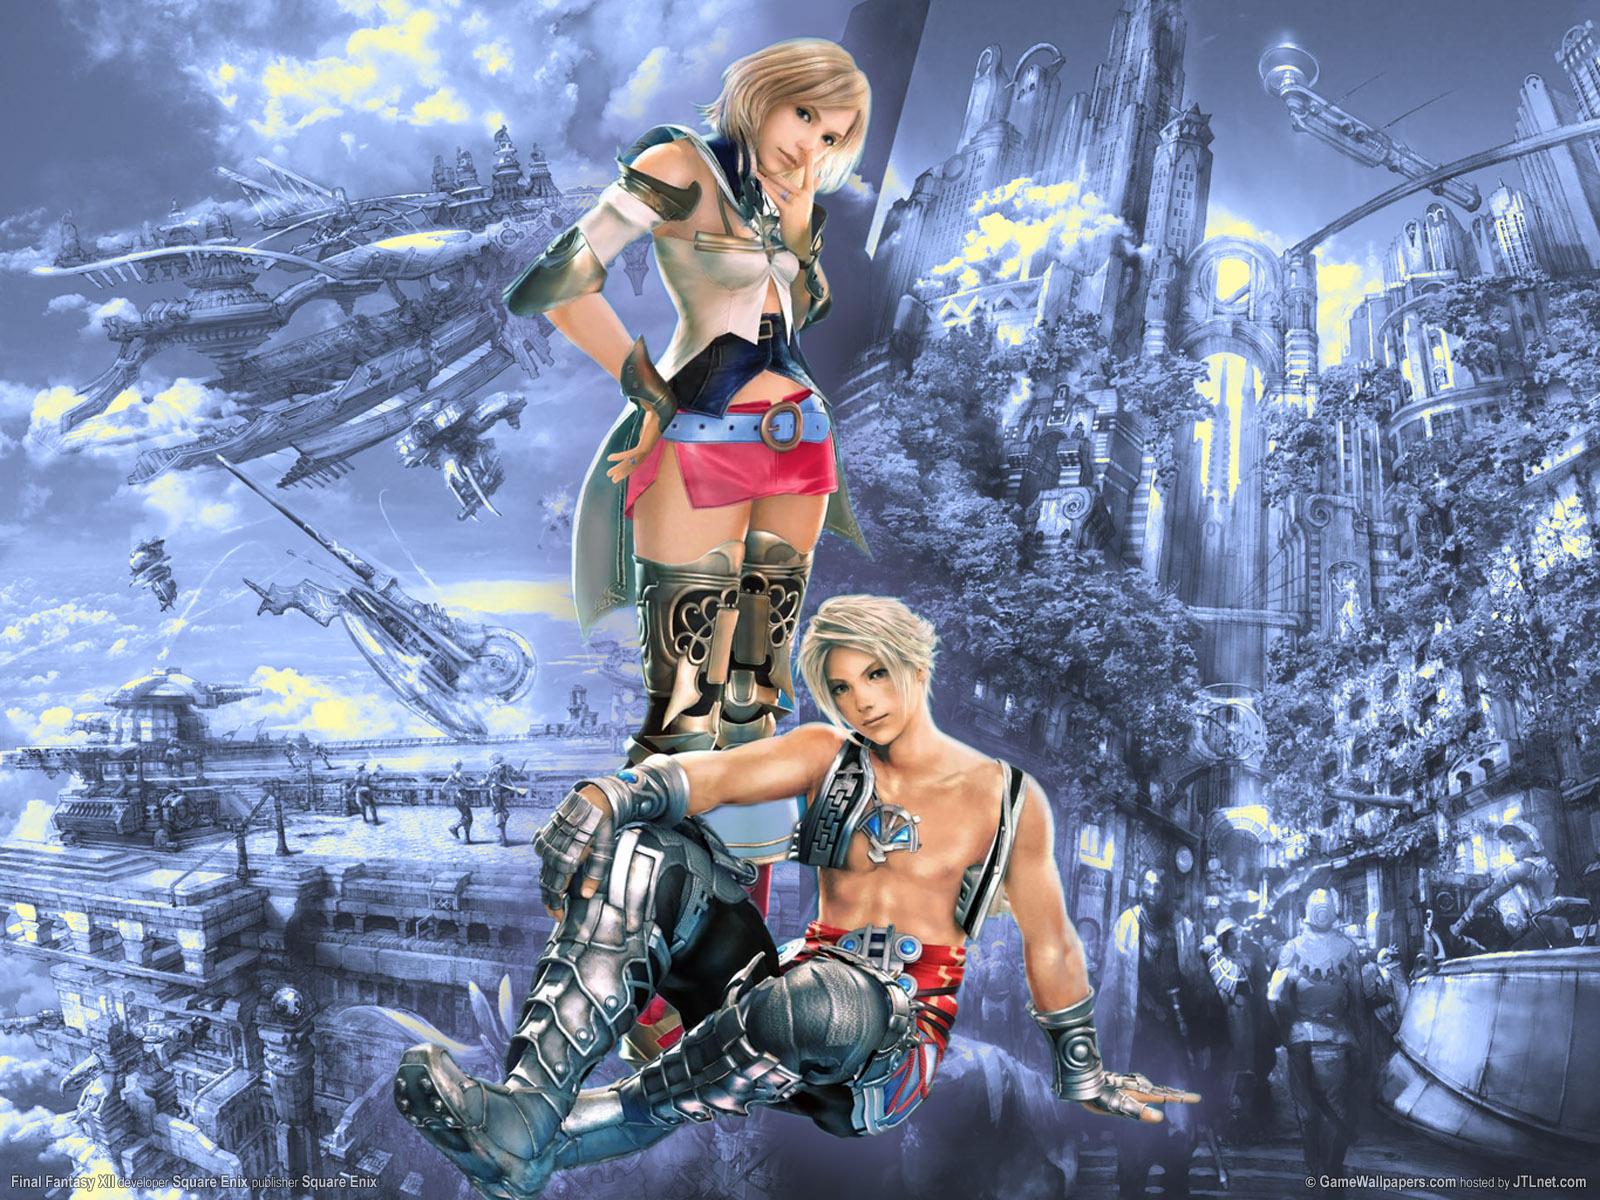 Final fantasy wallpapers - Fantasy game wallpaper ...